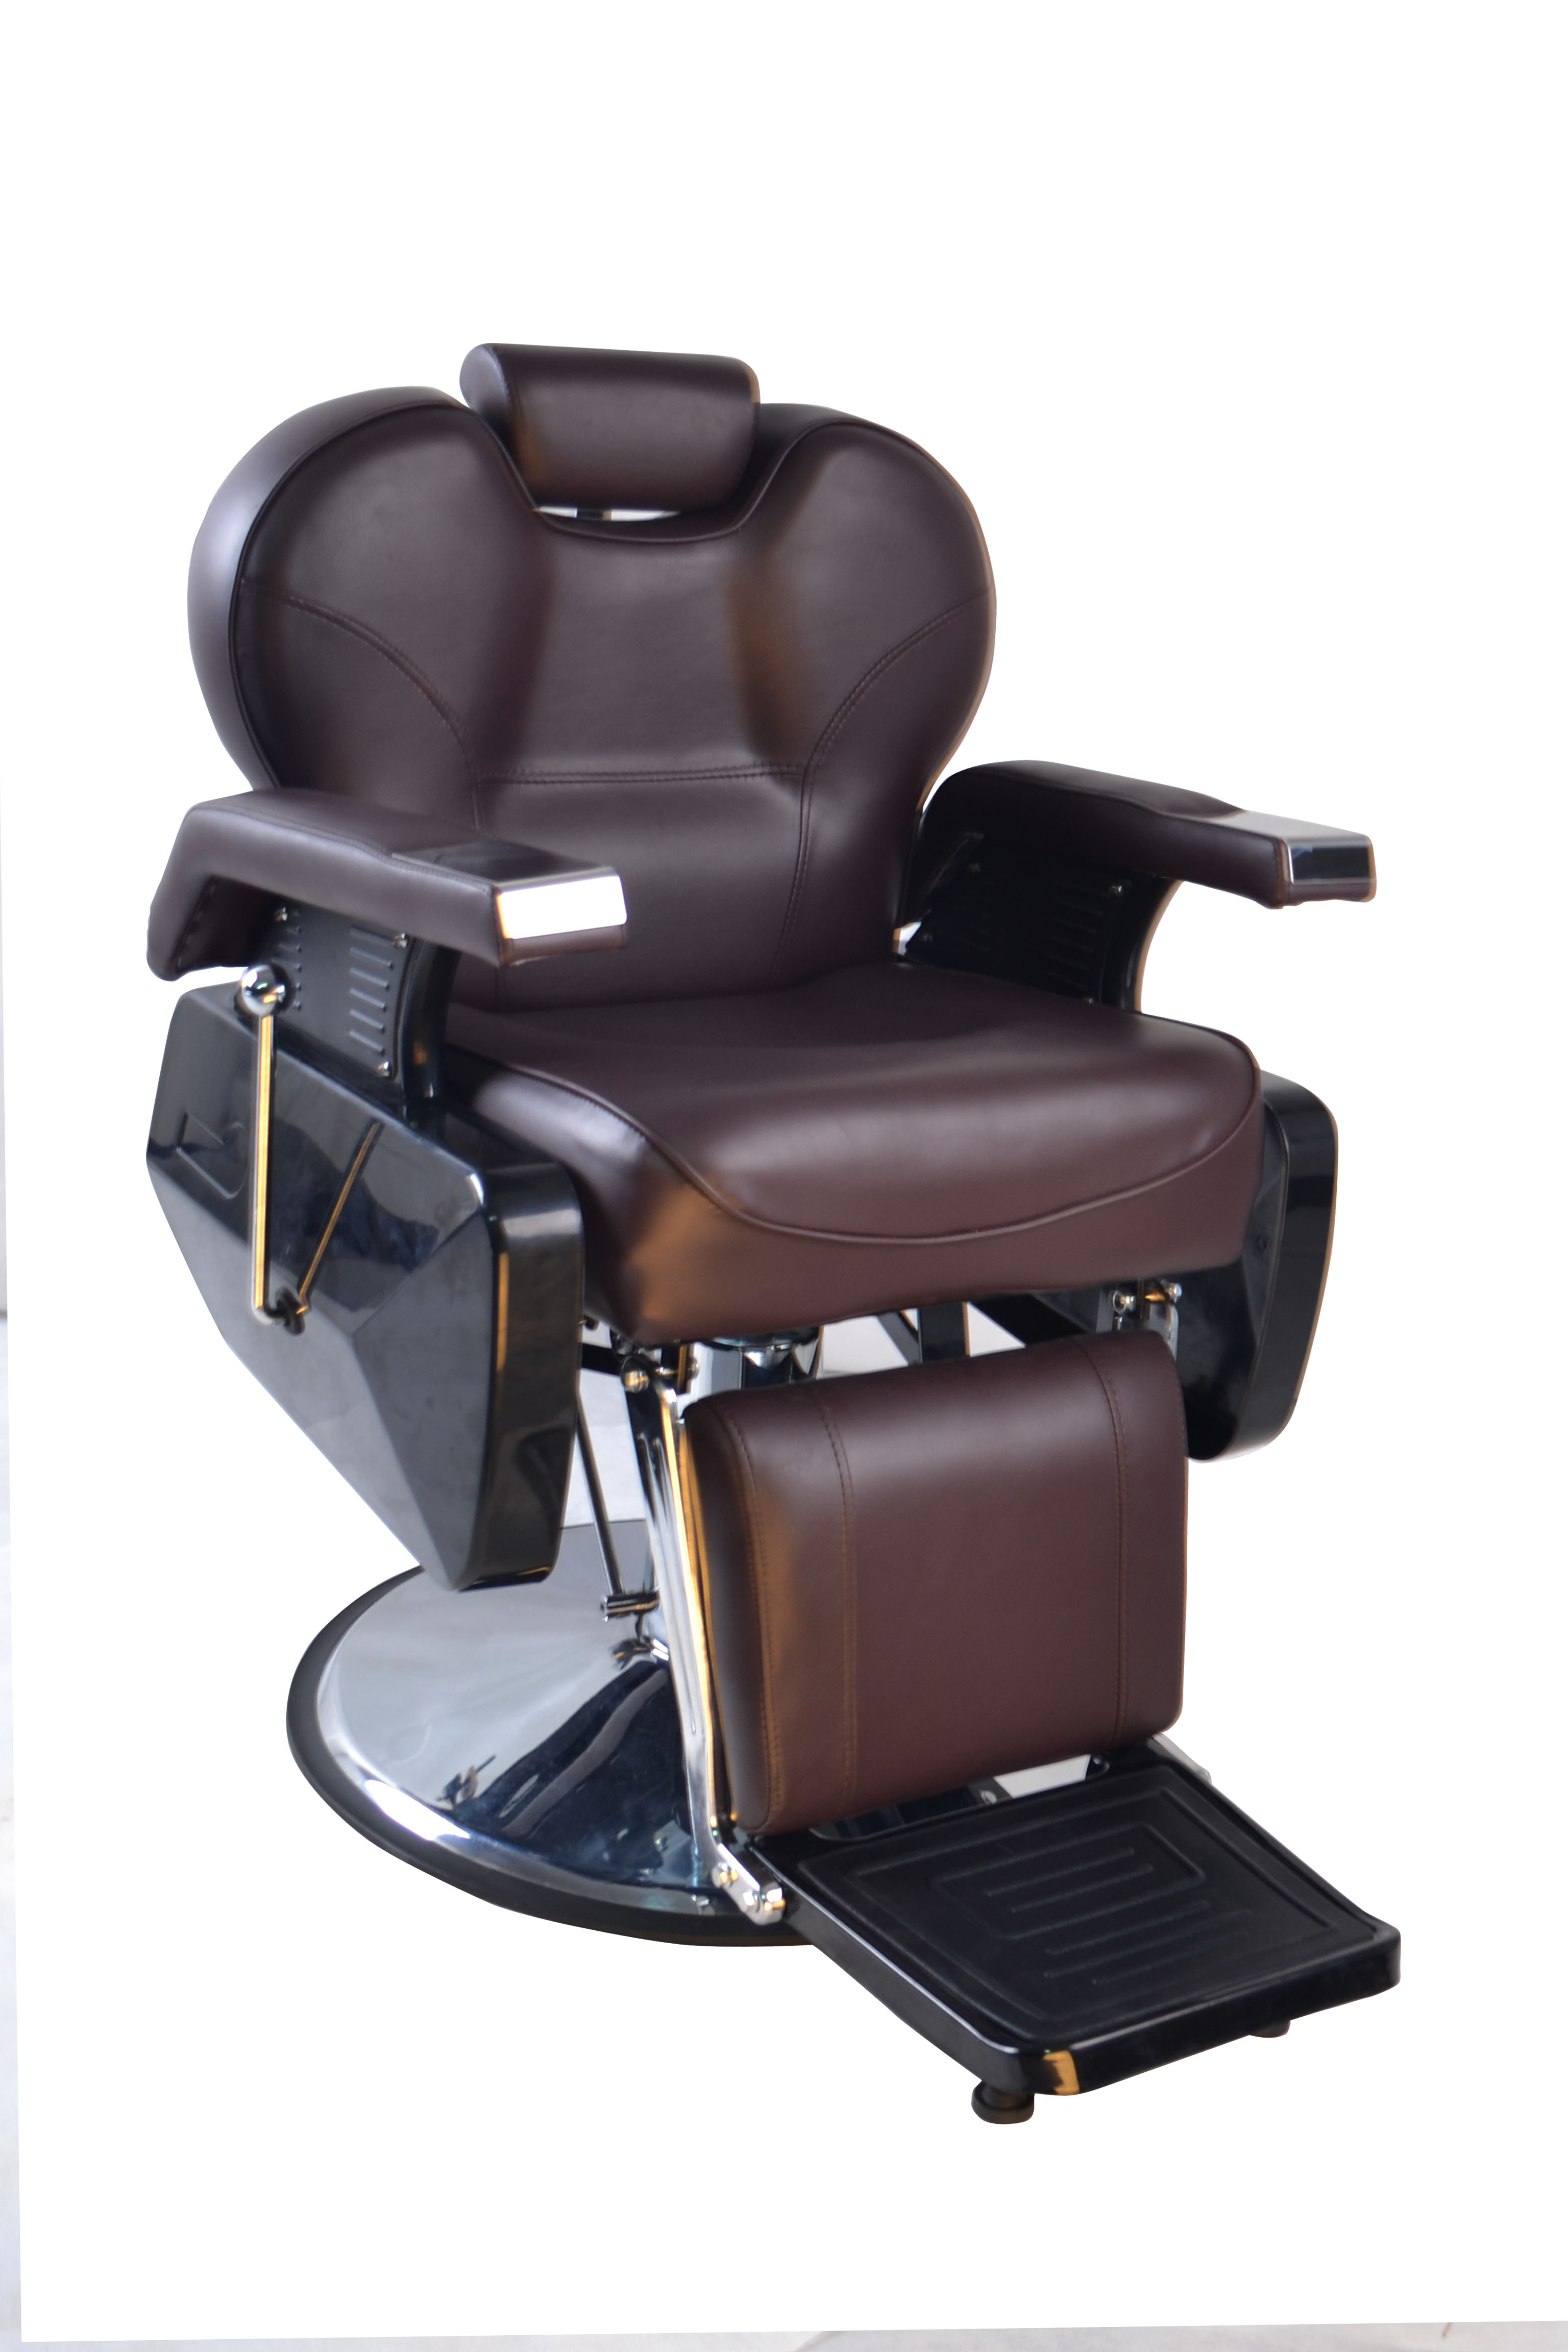 Barberpub Five Purpose Hydraulic Salon Beauty Spa Shampoo Barber Chair 8702brown Ebay